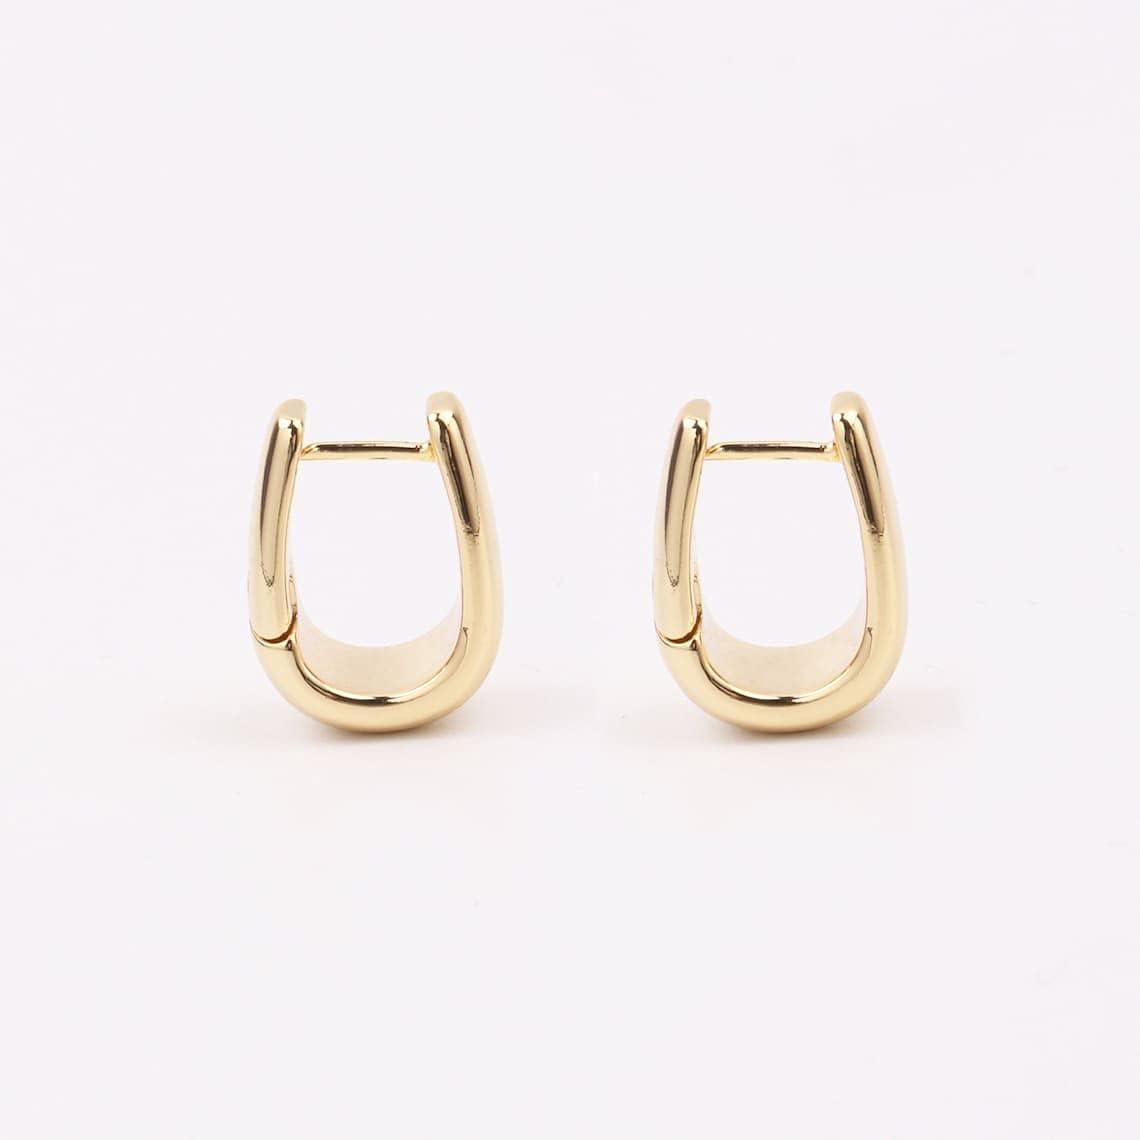 Custom Handmade 1 Pair Delicate 22.9mm 18kt Gold Filled Chunky Minimal Round Ball Beads C Type Hoop Earrings Wholesale Bulk Factory Supply